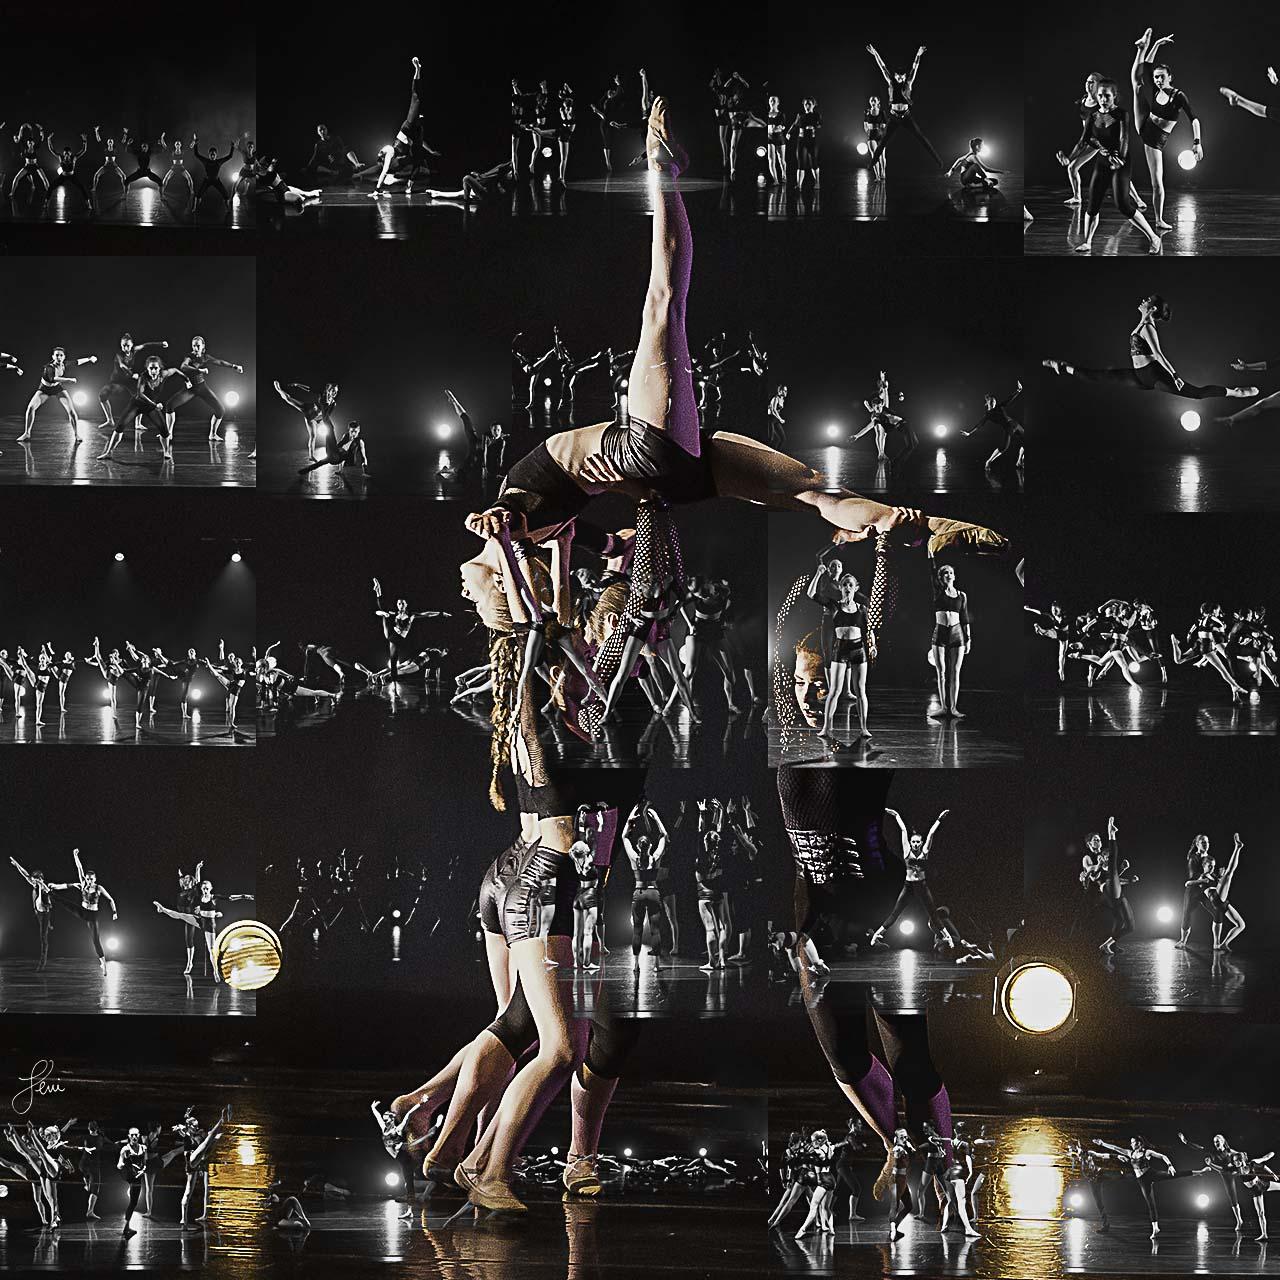 Salt Creek Ballet, Beatbox, Eddy Ocampo. Photo: Leni Manaa-Hoppenworth